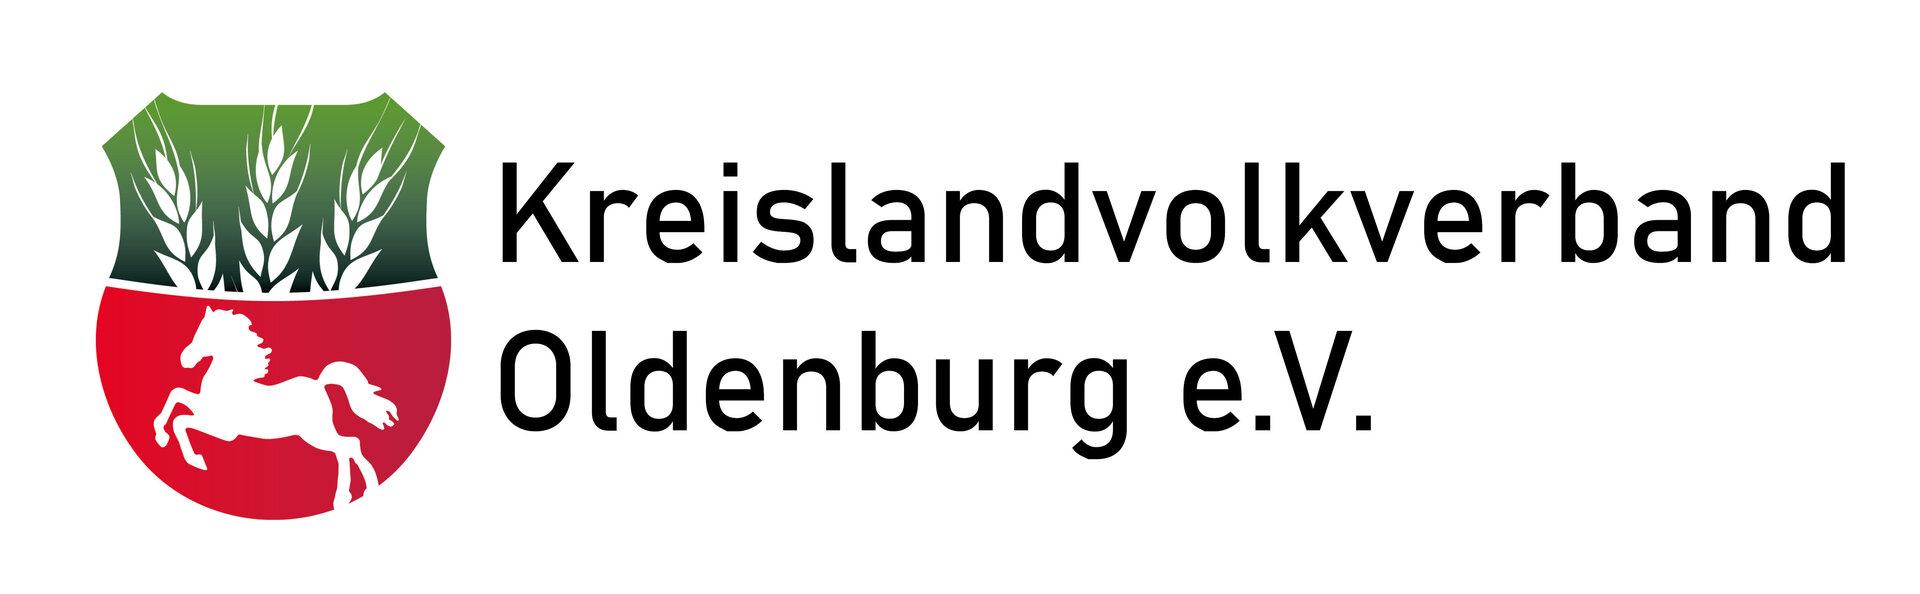 Landvolk Logo